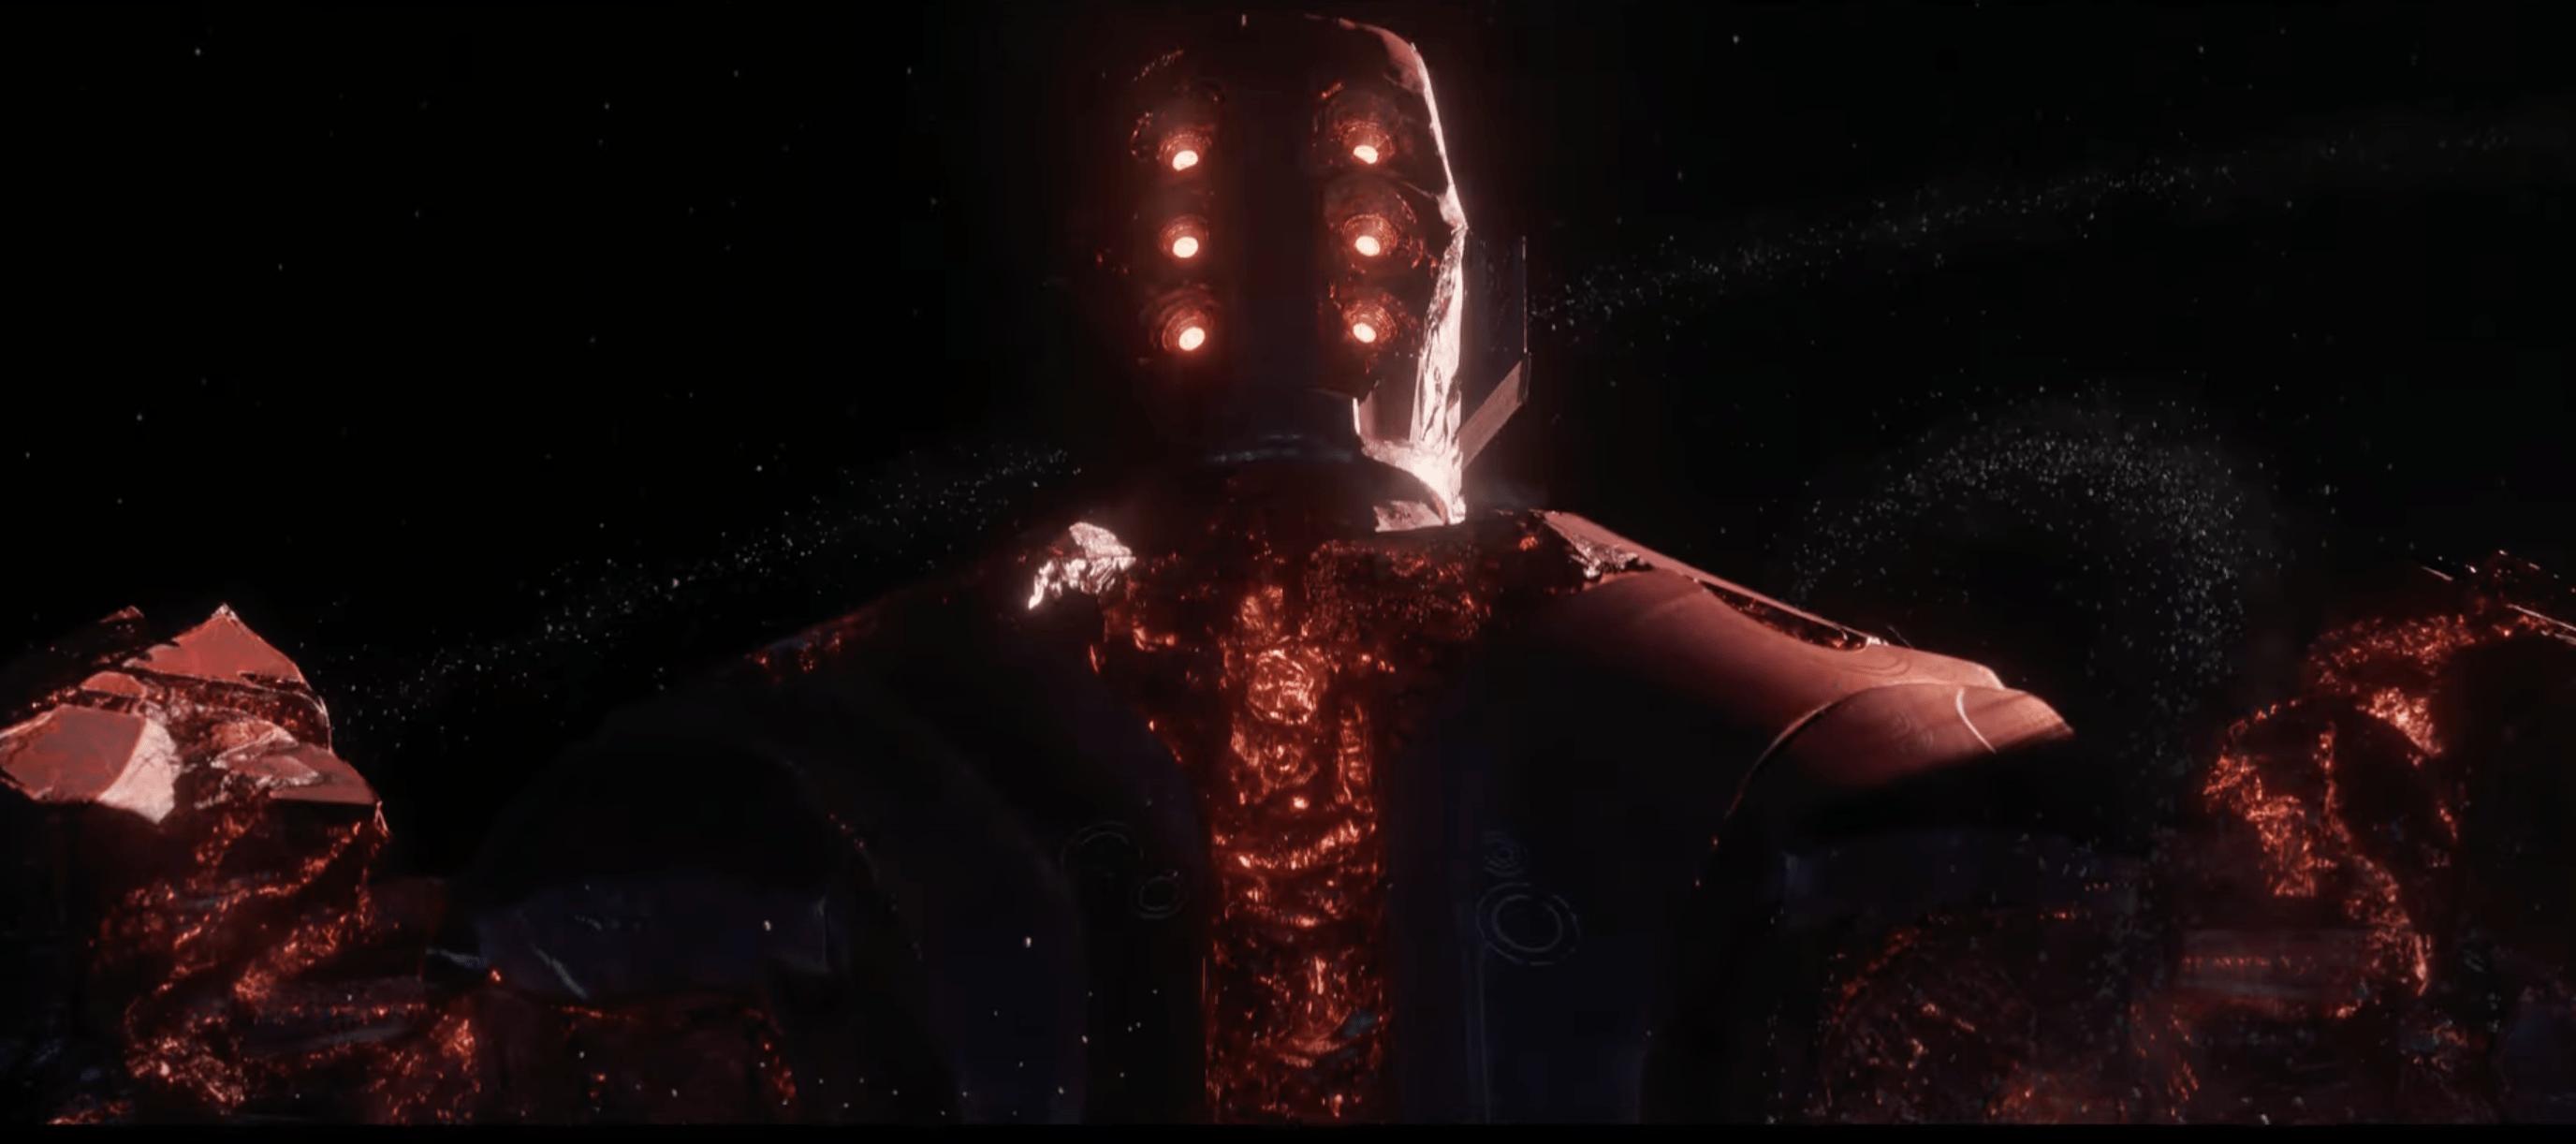 eternals trailer breakdown celestials Arishem